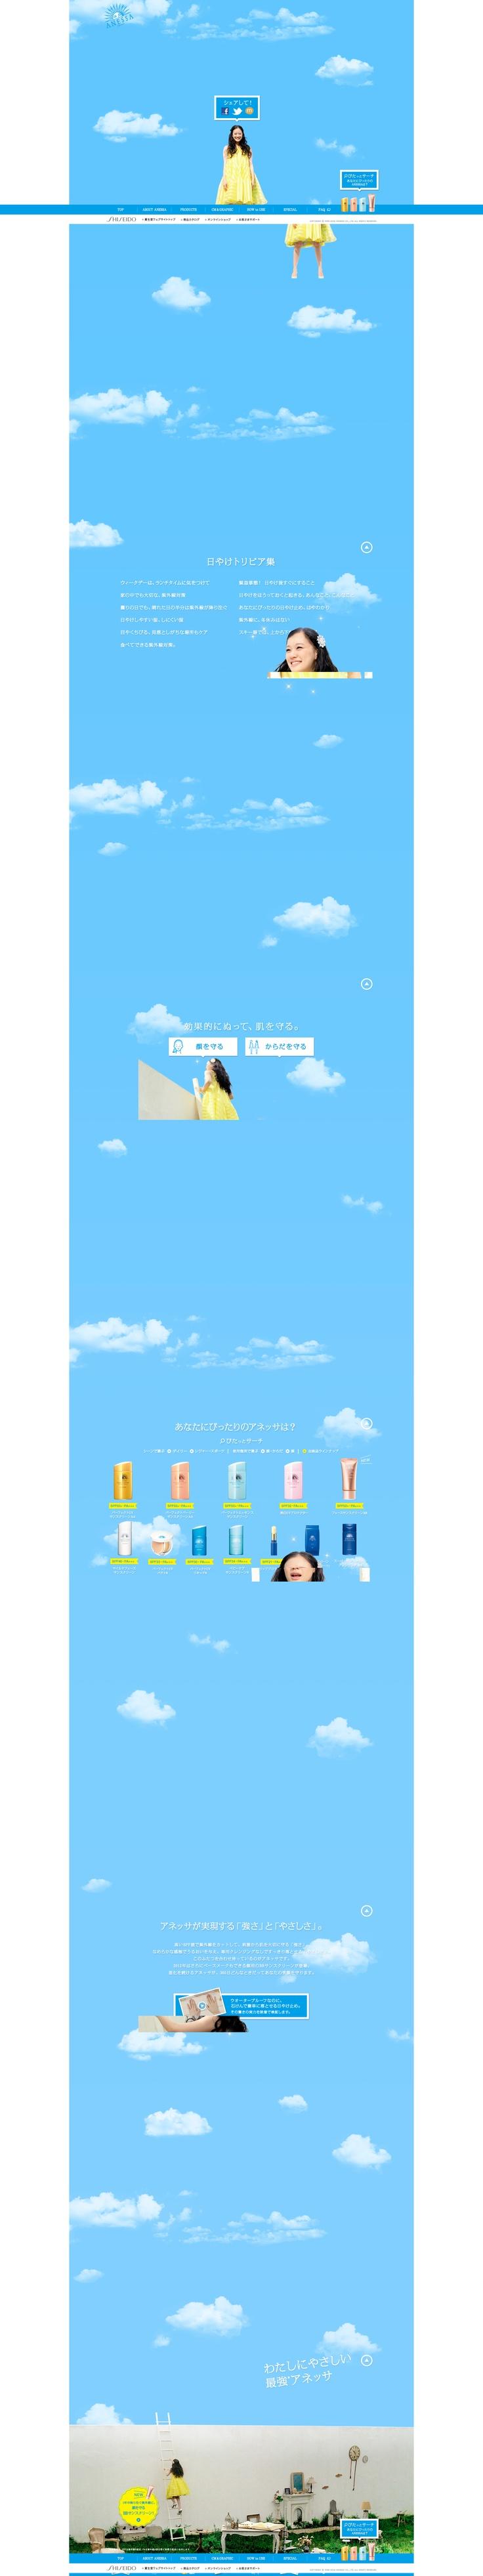 ANESSA | 資生堂  http://www.shiseido.co.jp/anessa/